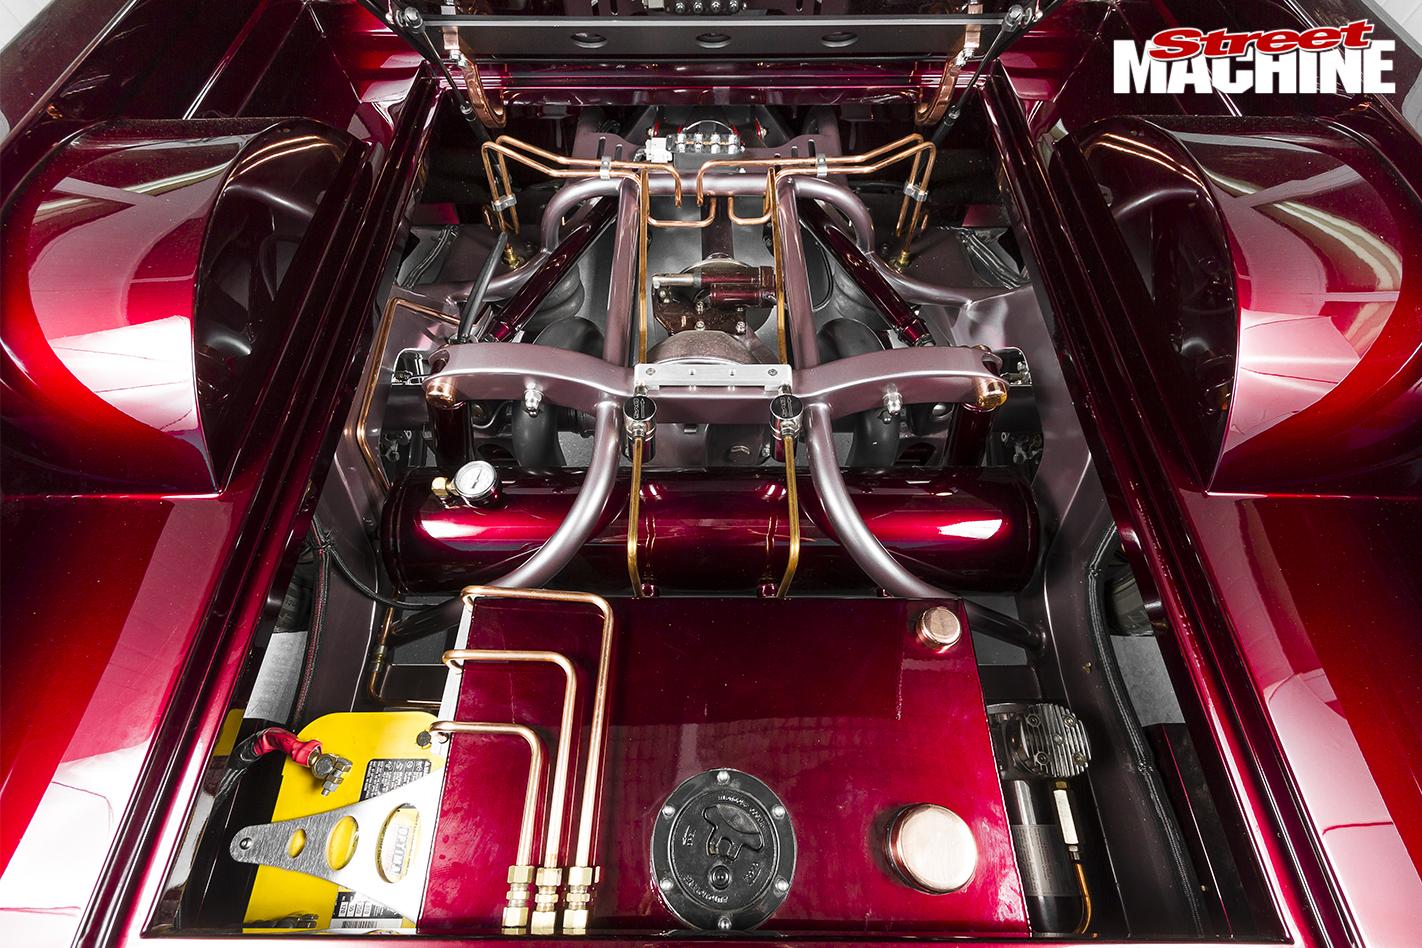 Holden -Rodeo -slammed -hydraulics